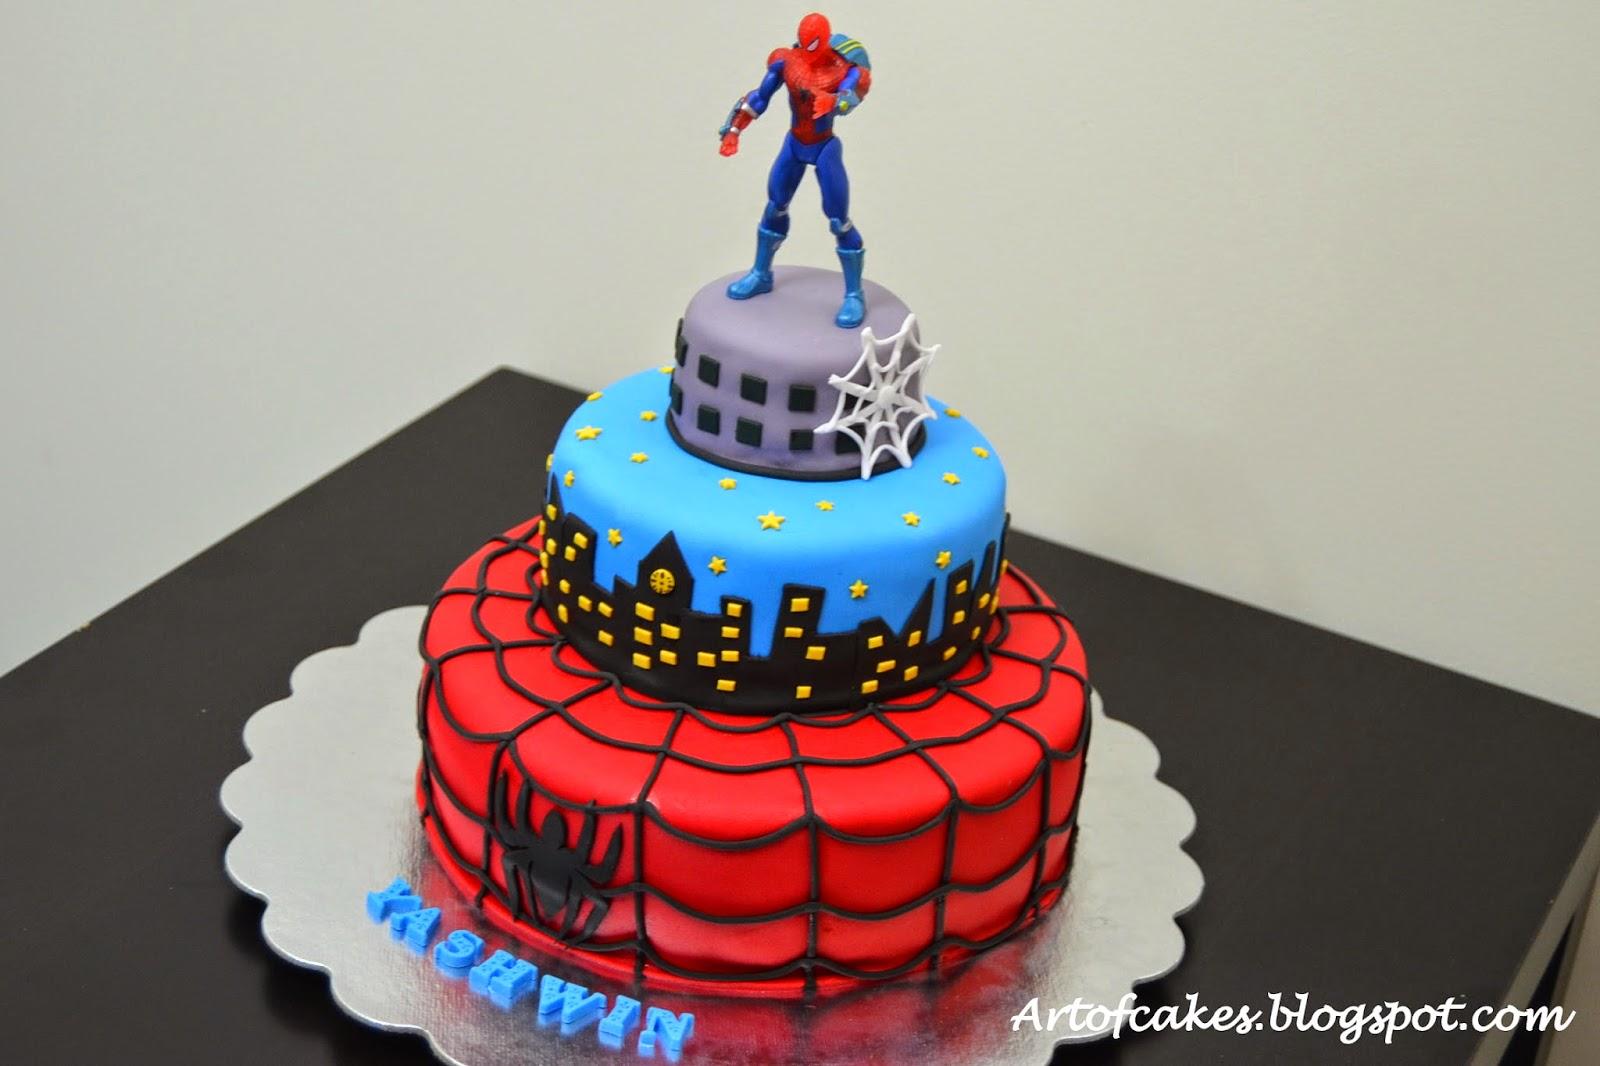 Art Of Cakes Spiderman Fondant Cake